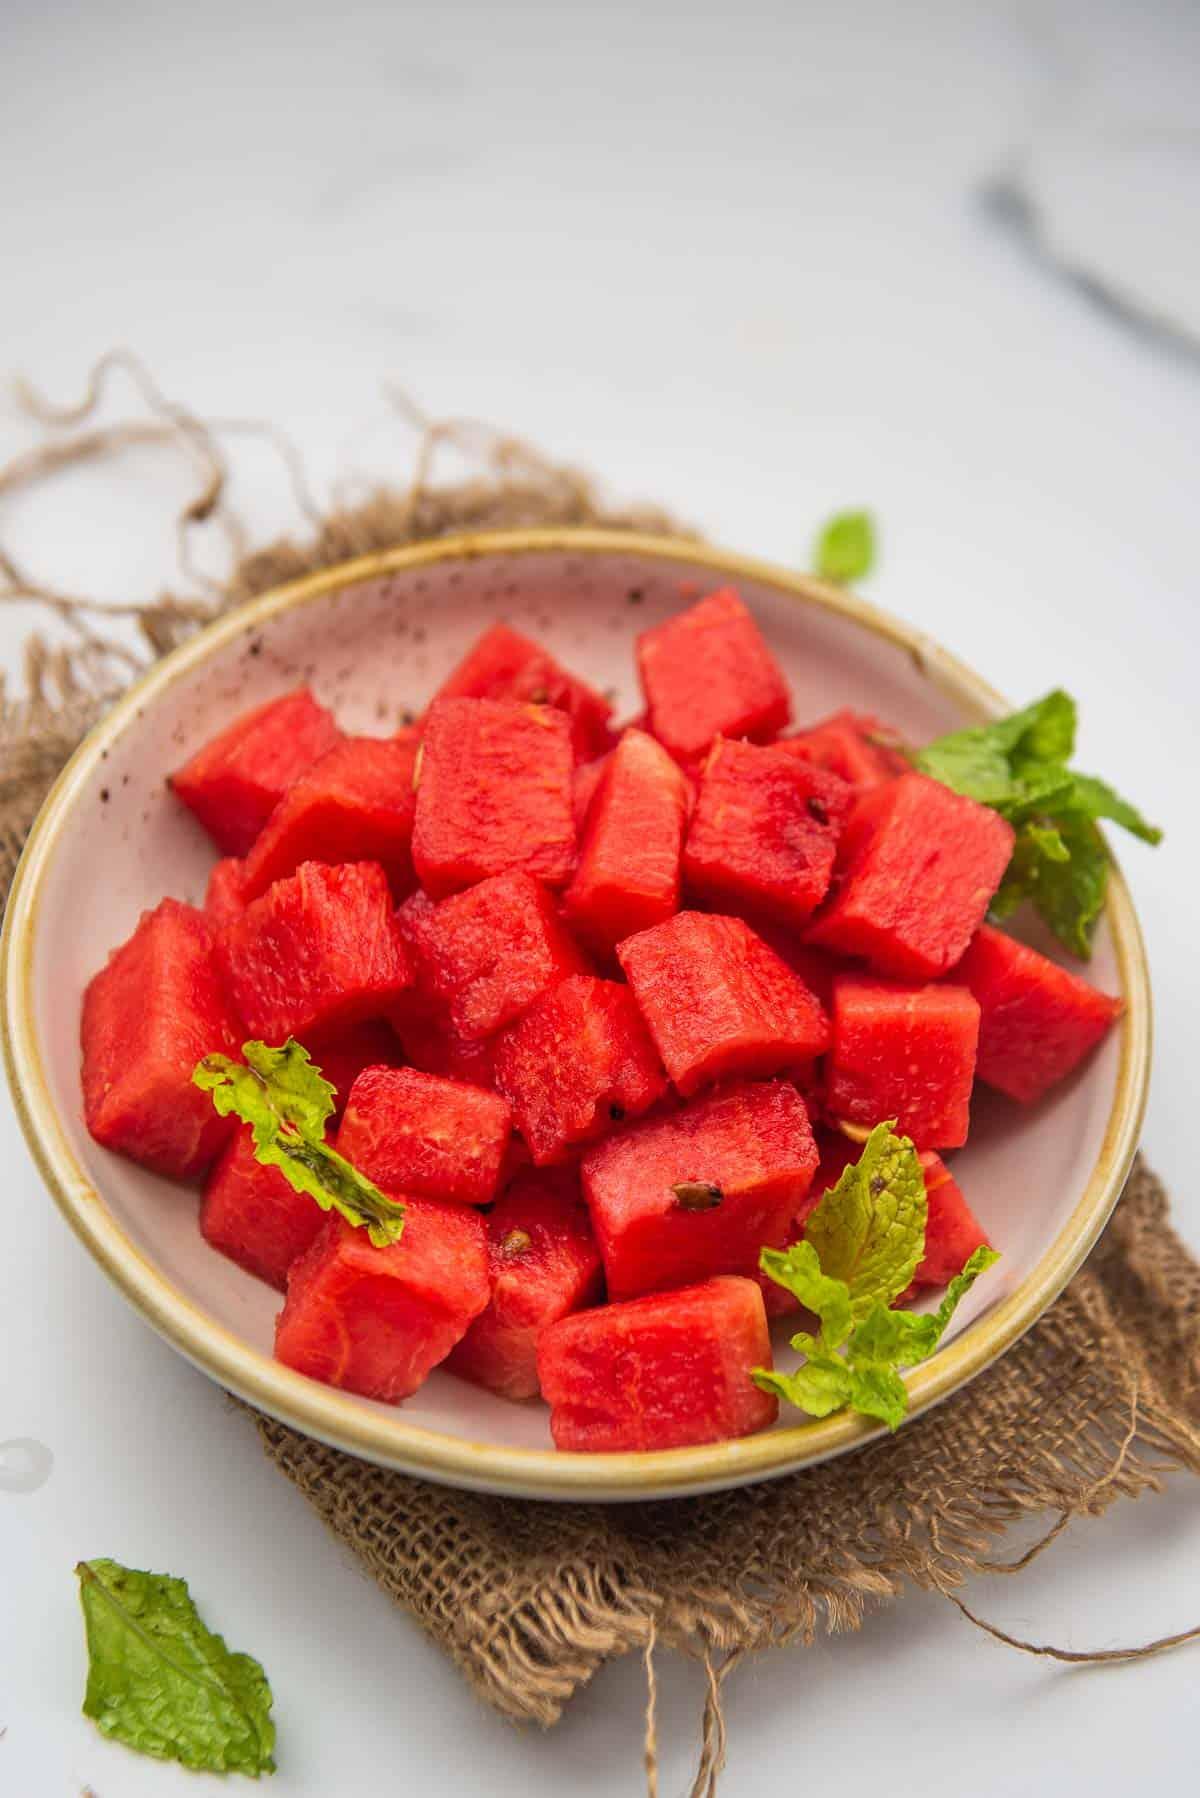 Watermelon kept in a bowl.